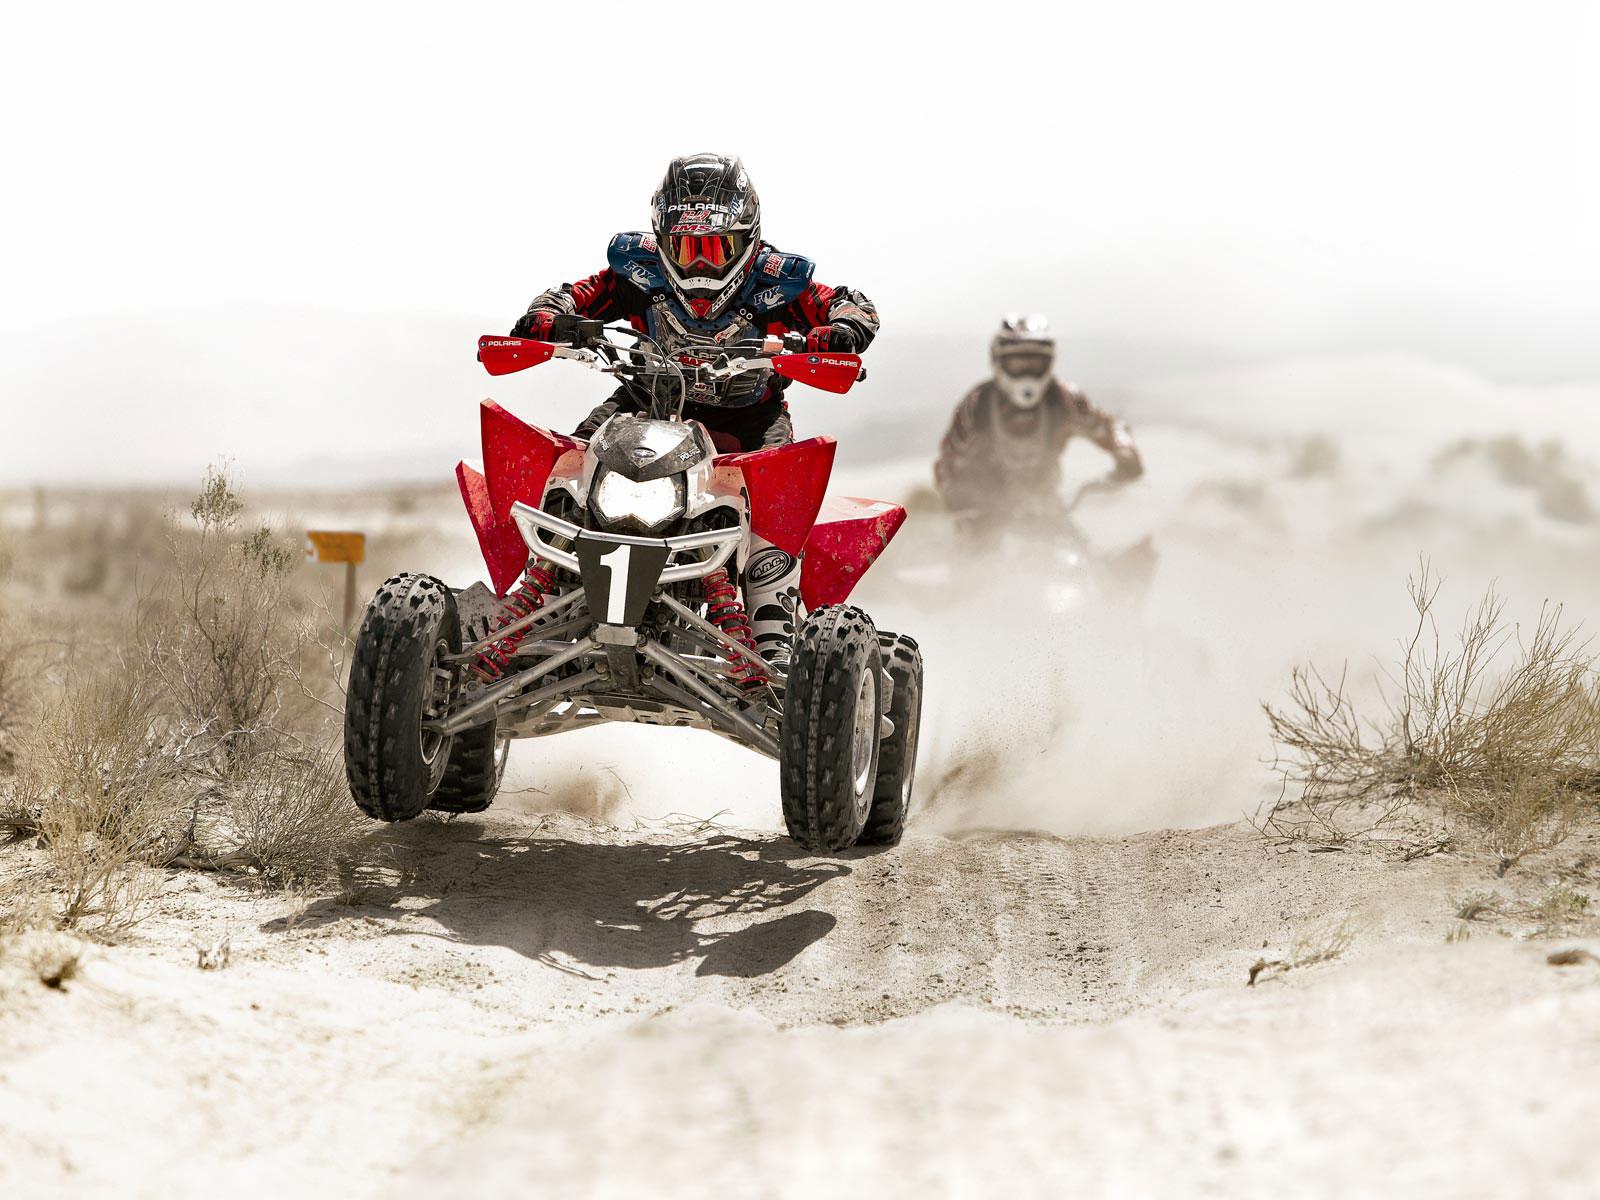 polaris outlaw atv quad offroad motorbike bike dirtbike